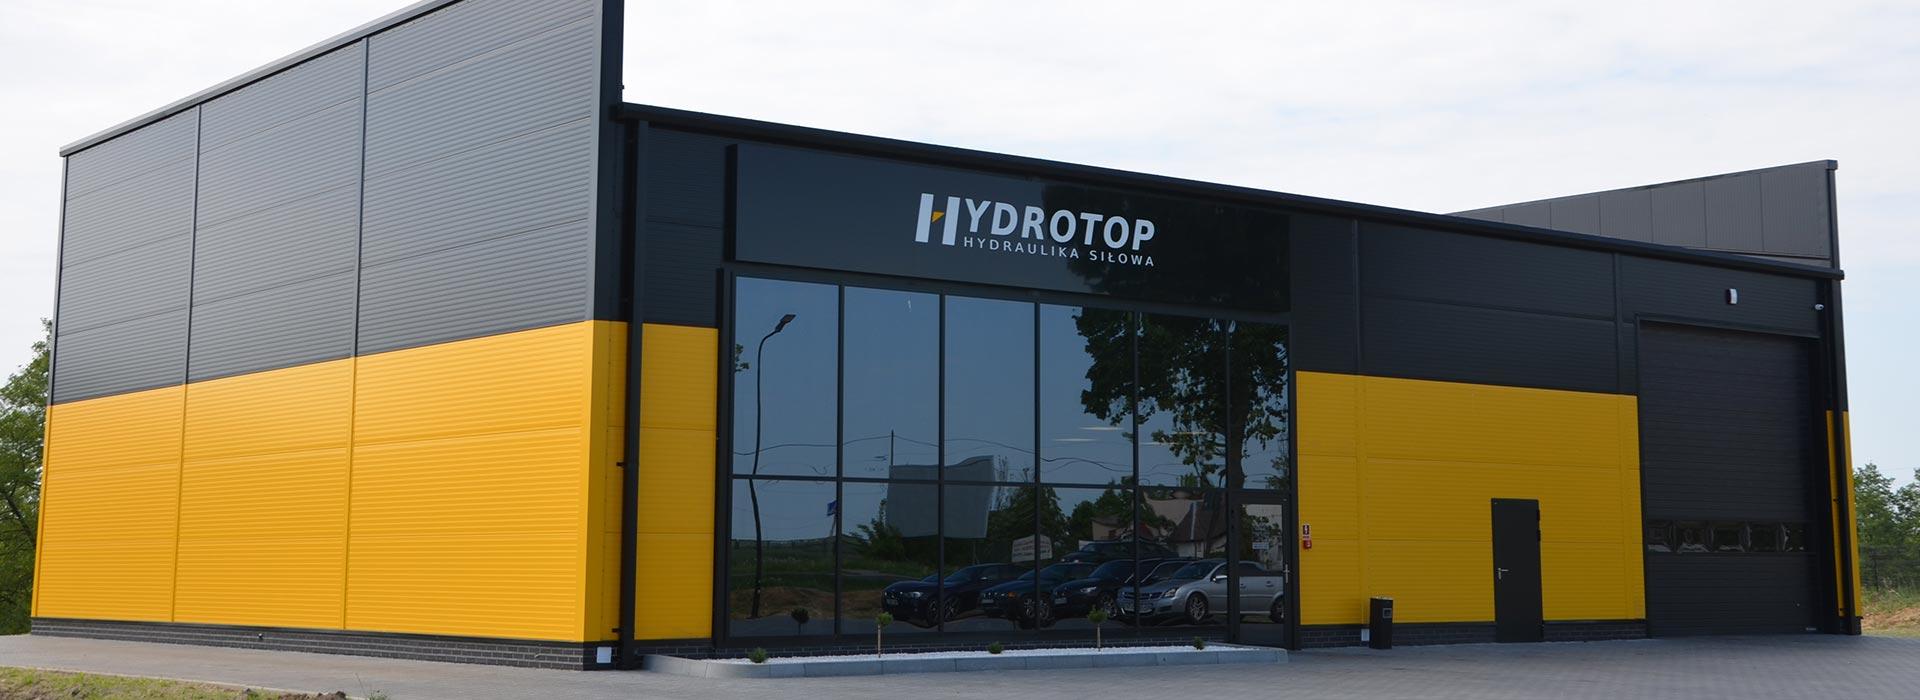 hydrotop sierpc